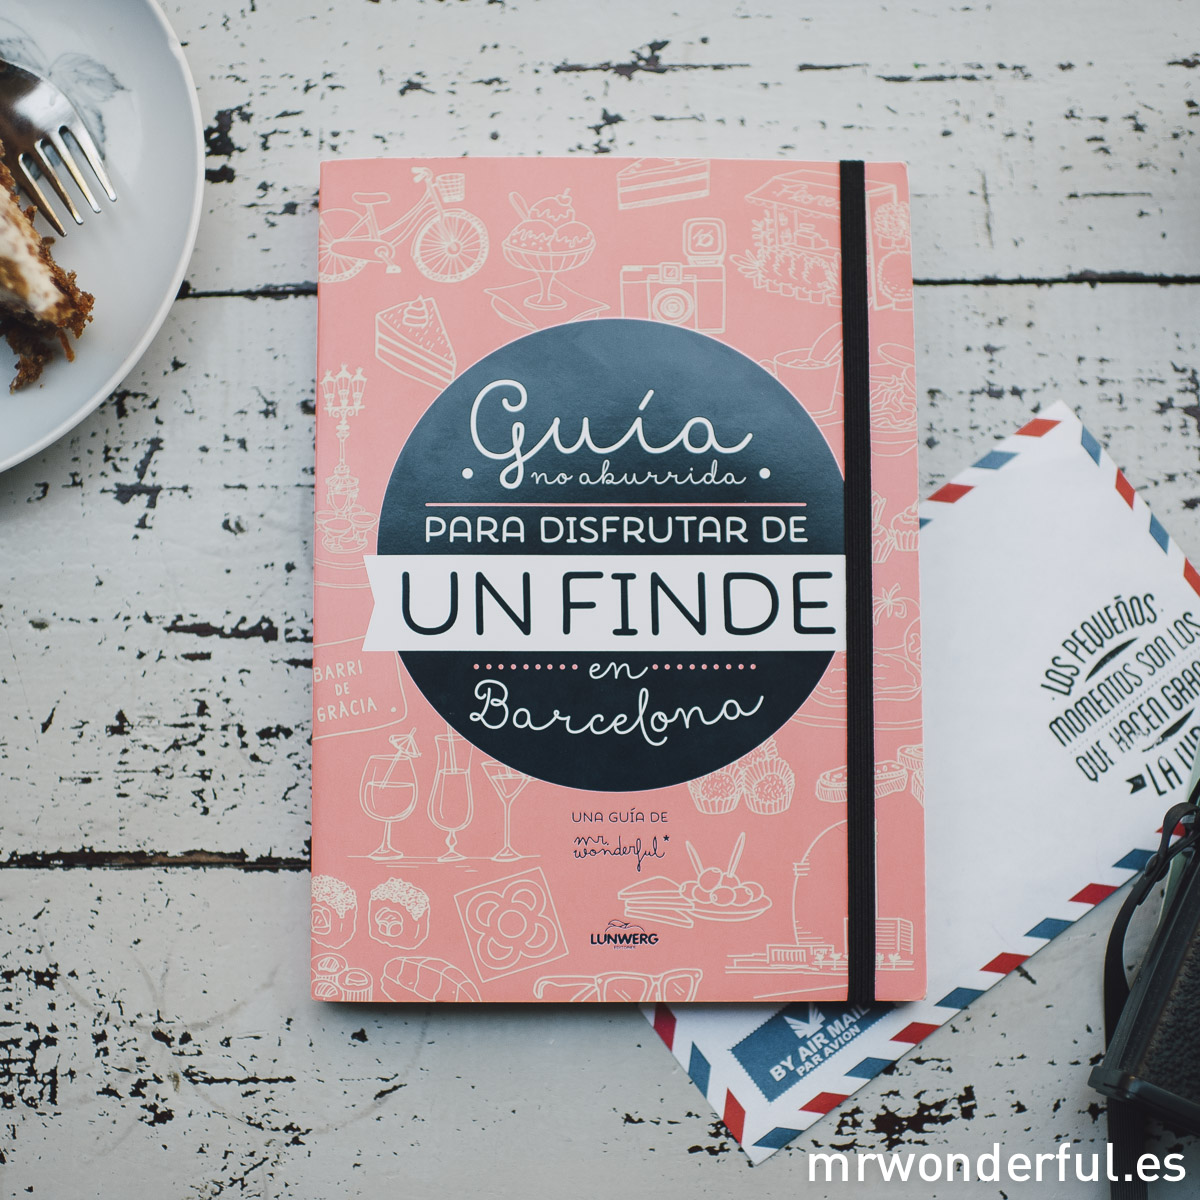 mrwonderful_guia_01_guia-no-aburrida-finde-barcelona-12